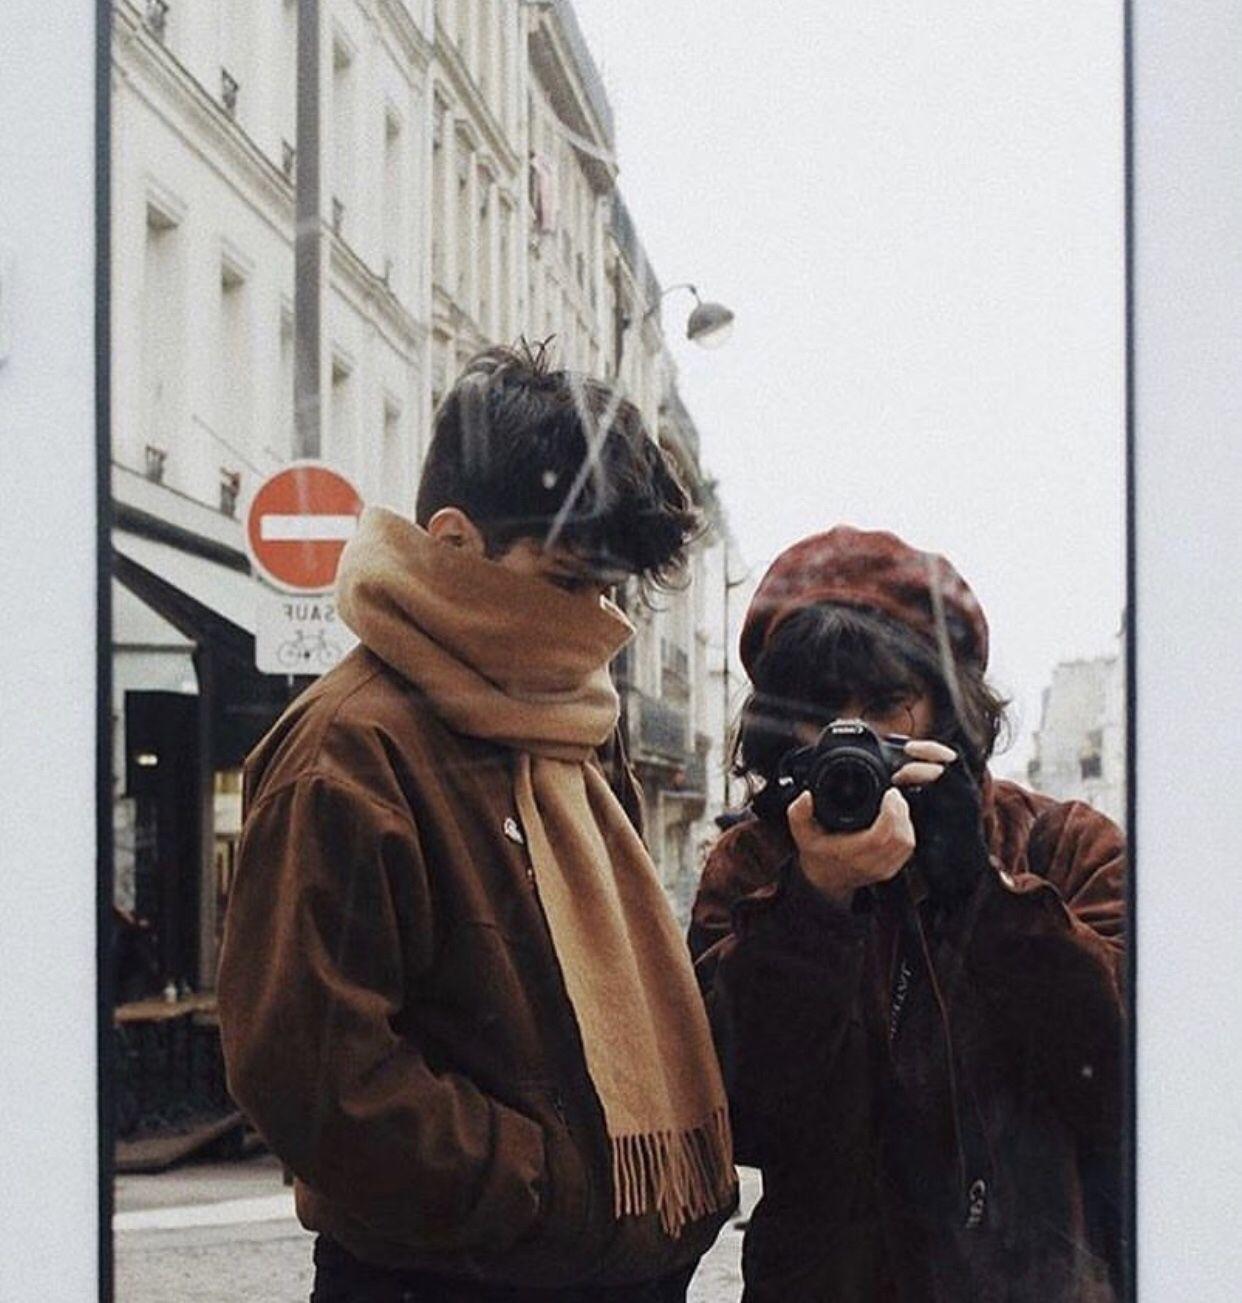 Photo of ᵖⁱⁿᵗᵉʳᵉˢᵗ | ʳᵒᵐᵃⁿᵗⁱᶜⁱˢᵉ ♡ mood, vibe, aest…